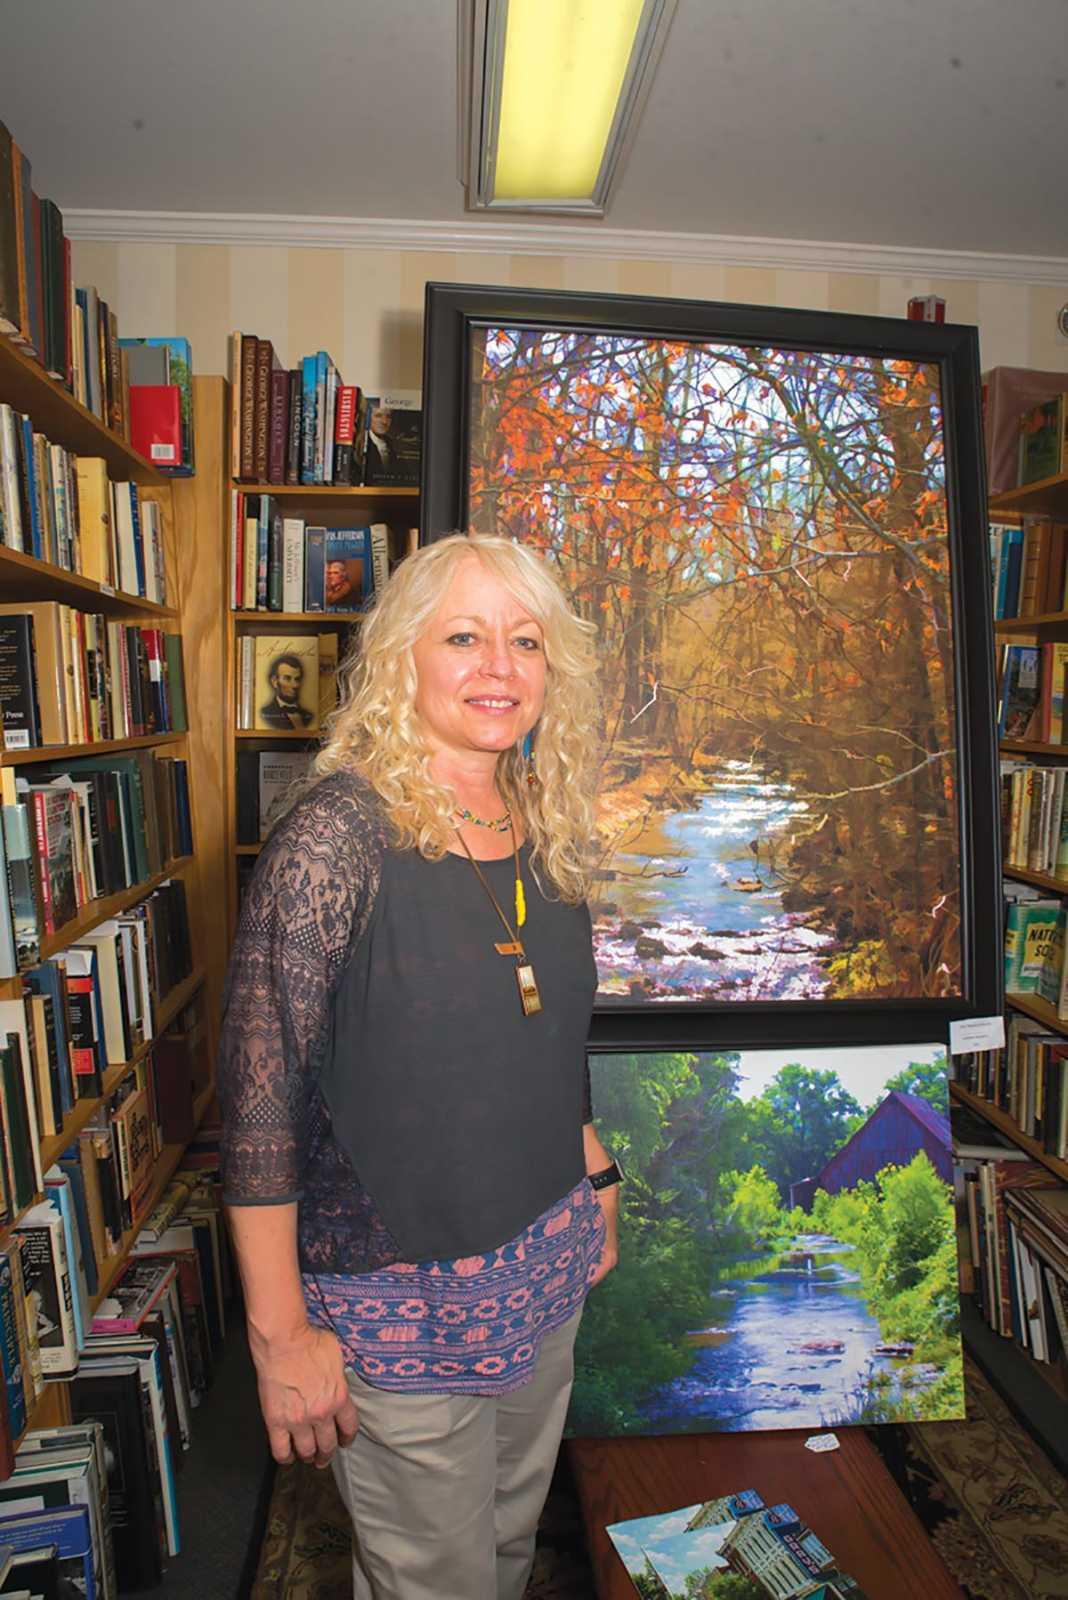 Debbie Smartt at Landmark Booksellers. Photograph by Tiffani Bing